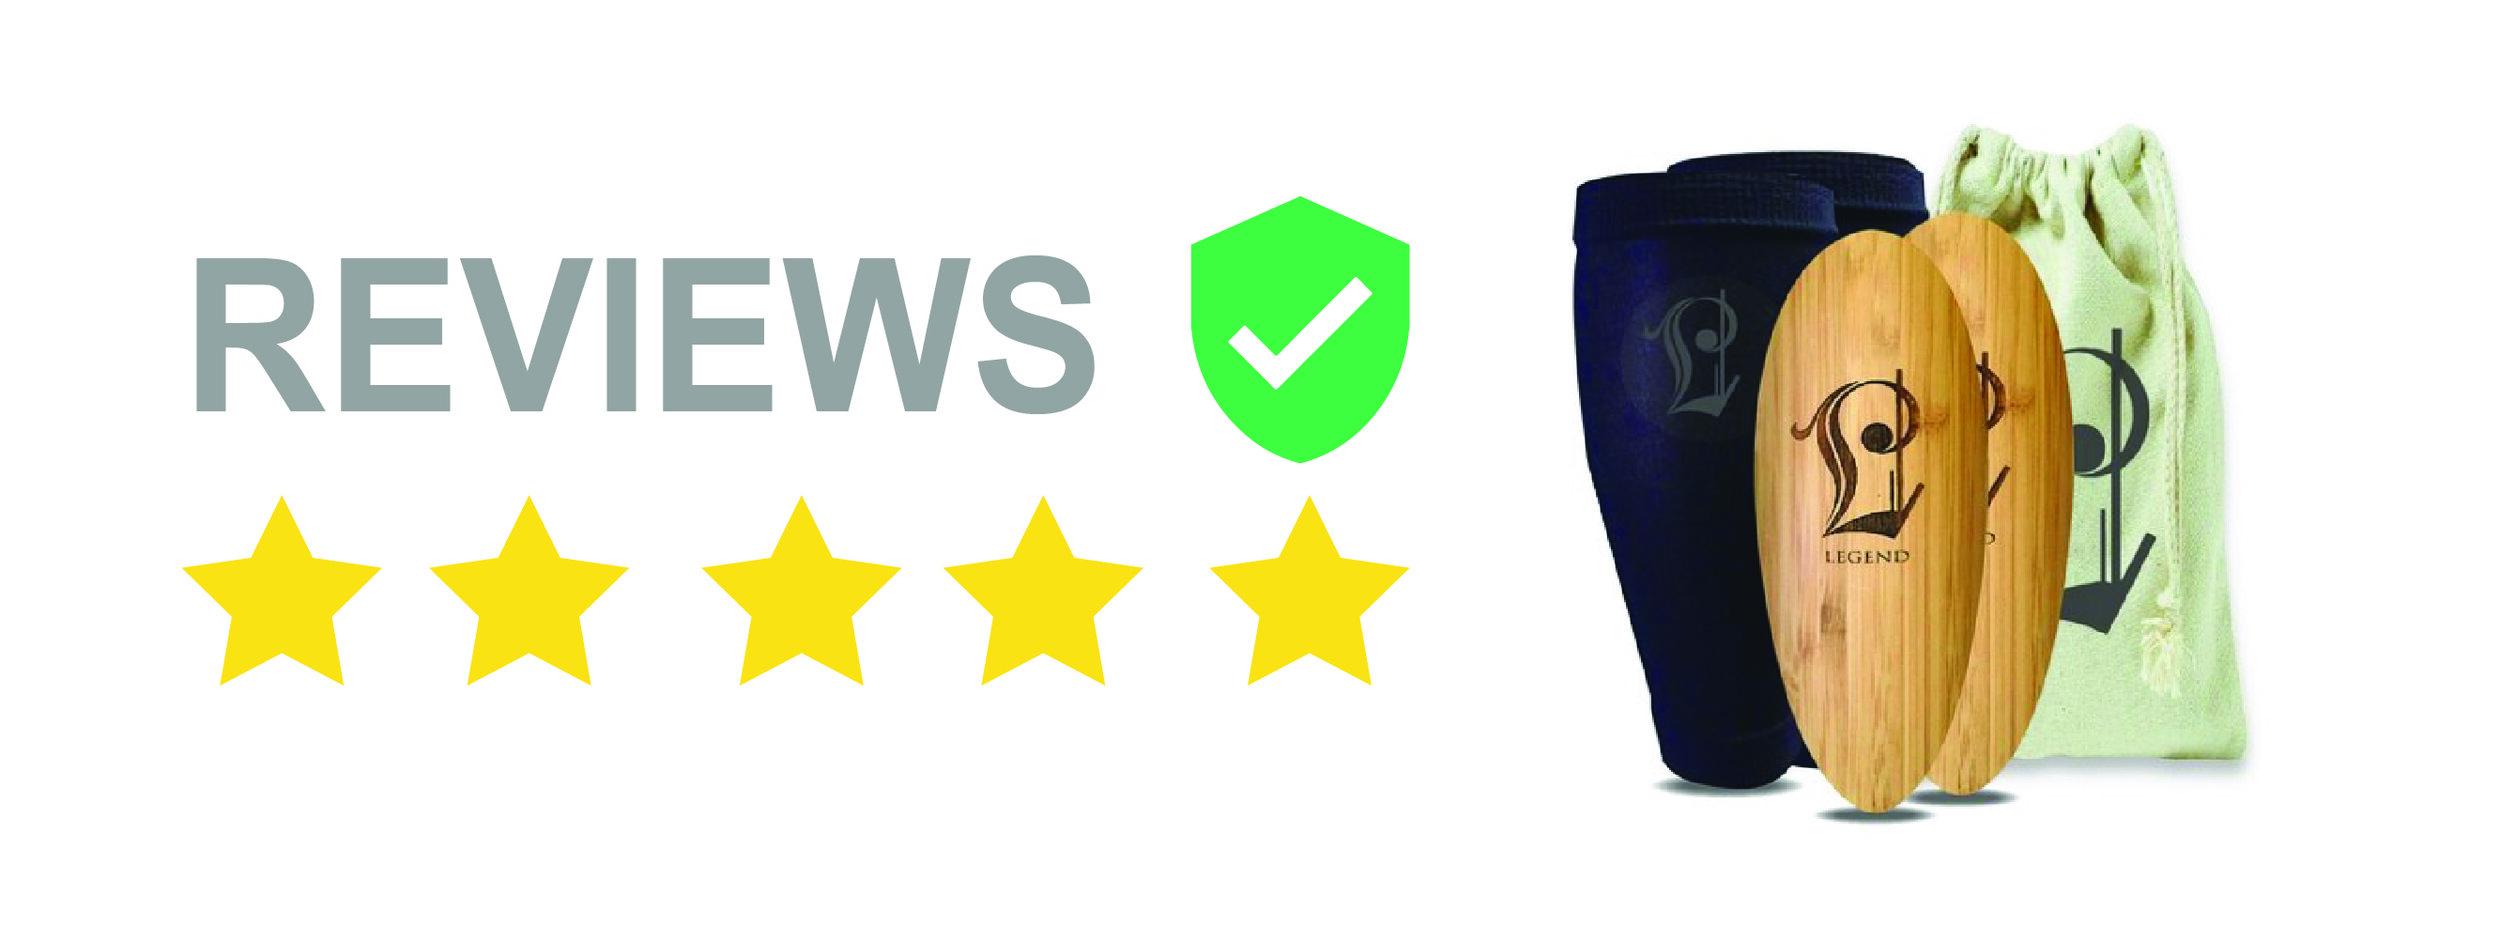 Review HEADER-01.jpg